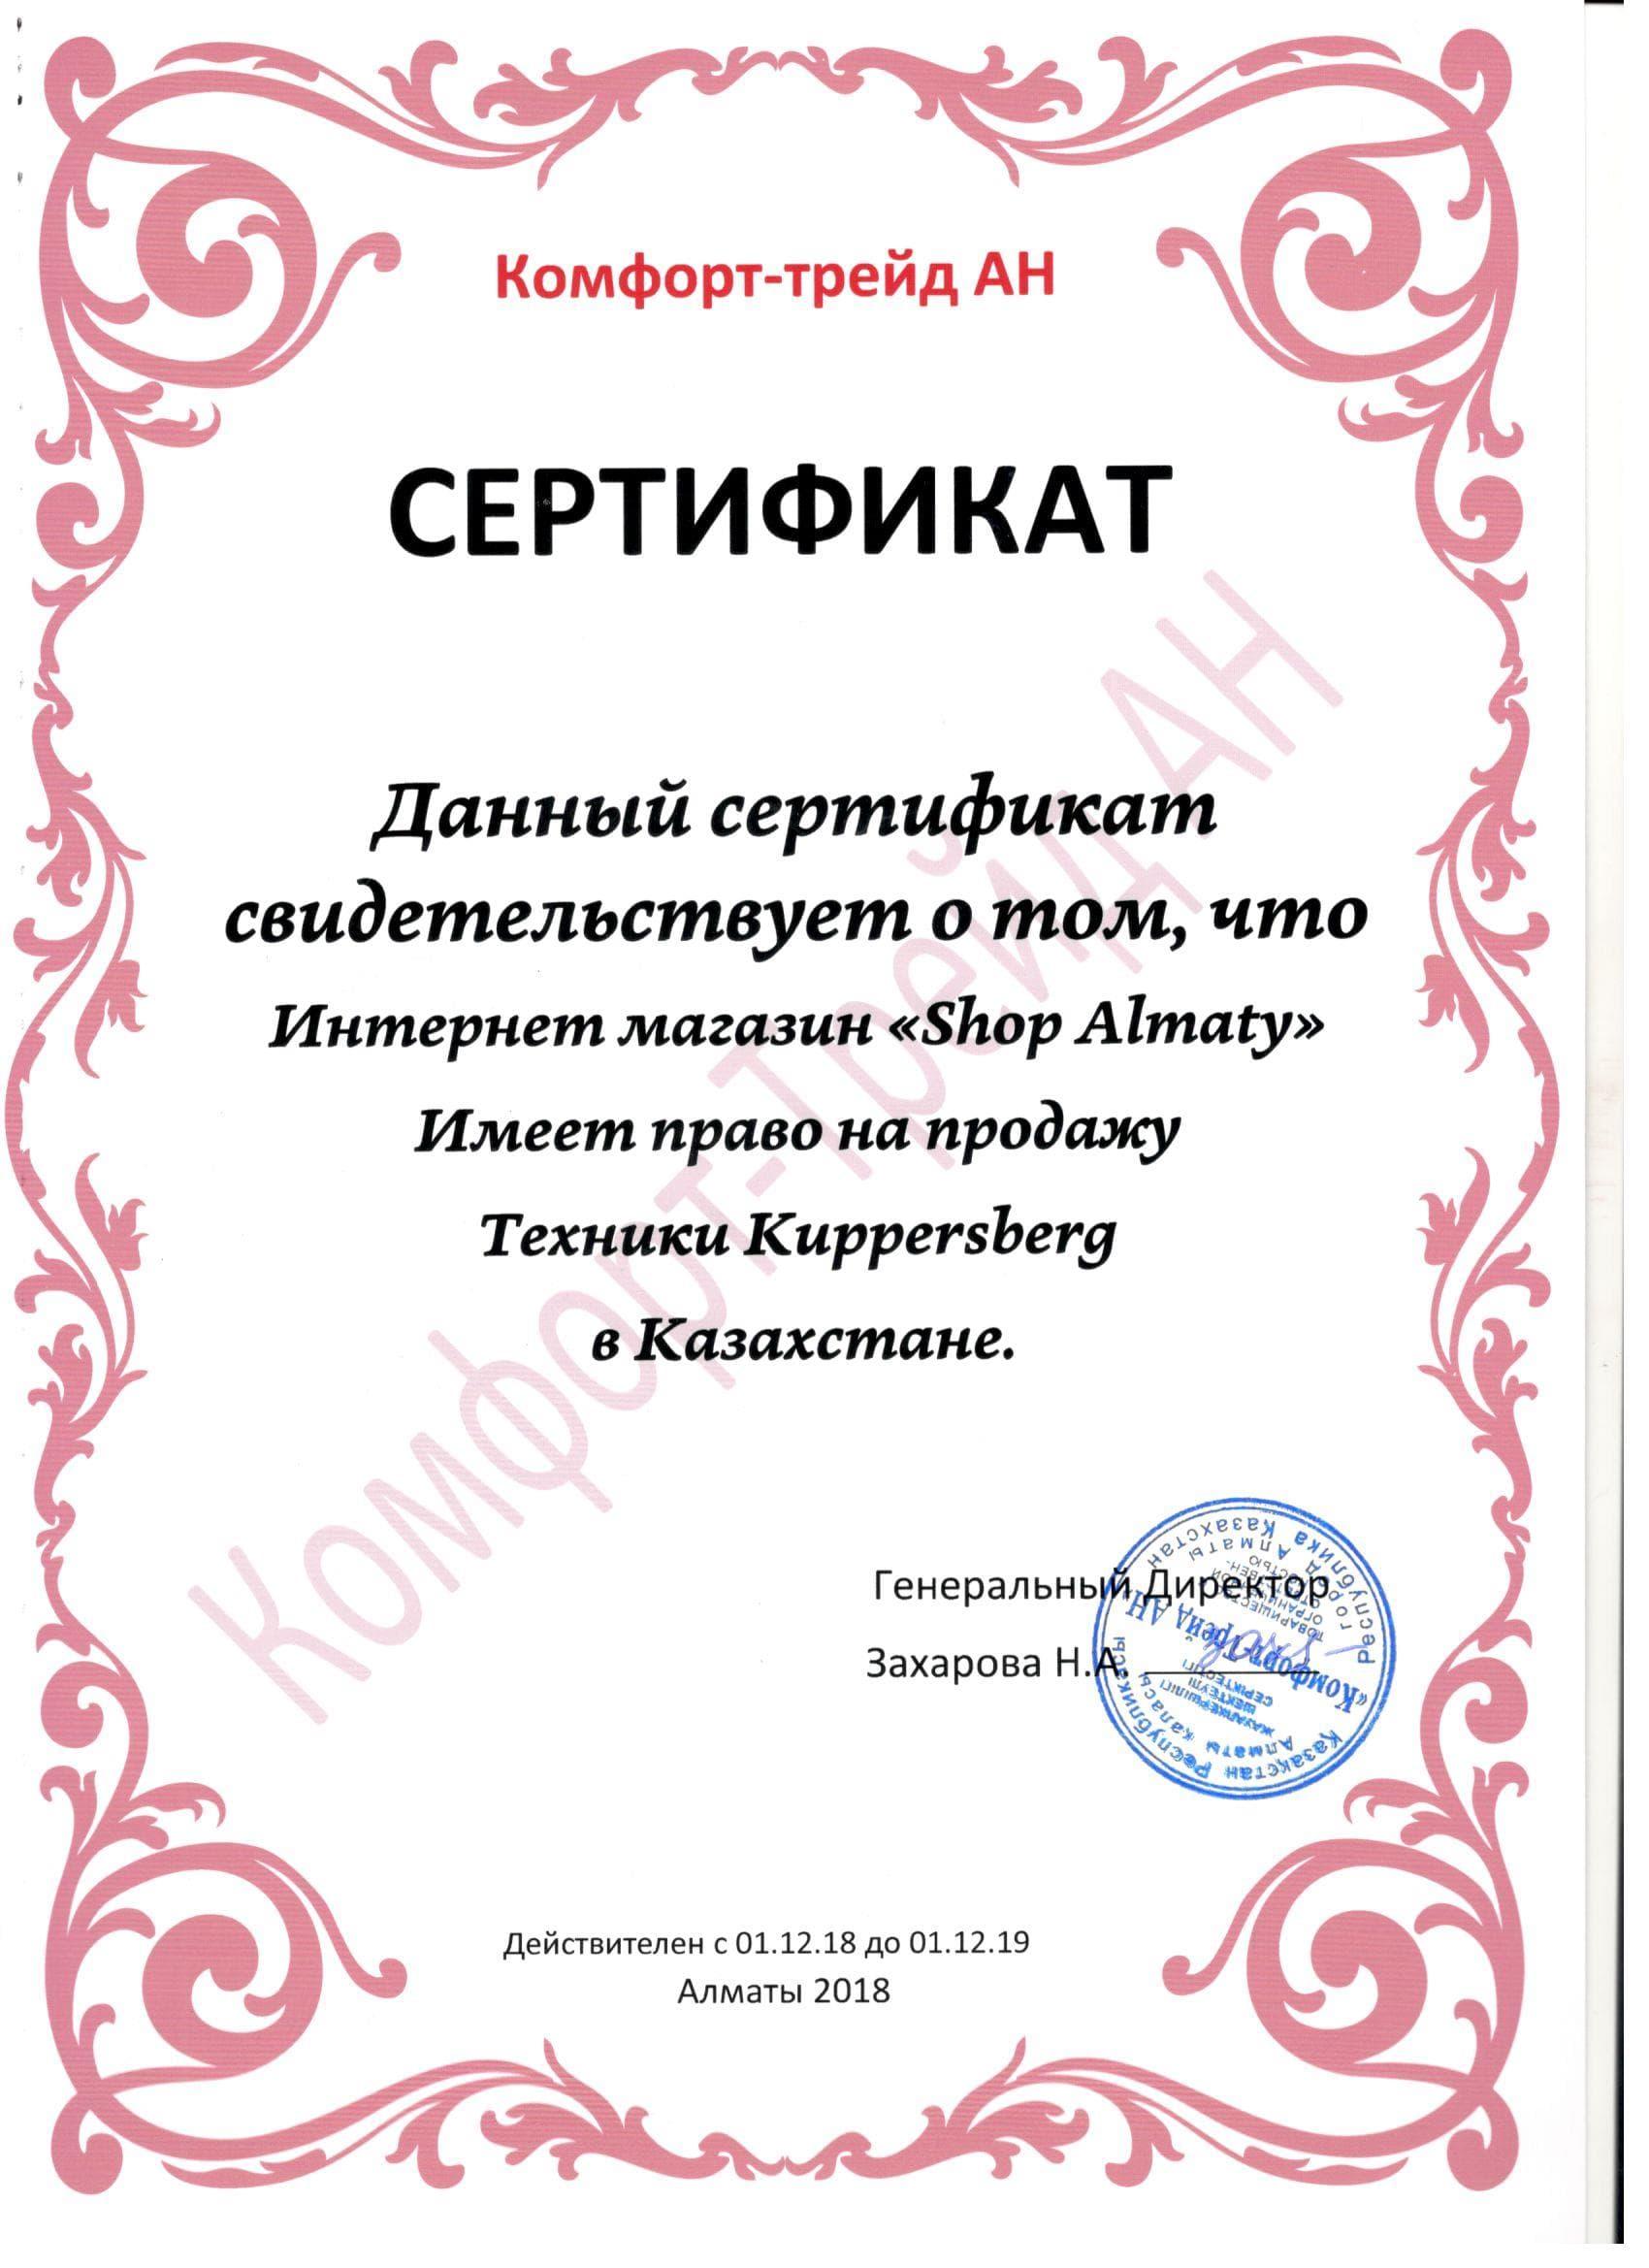 Сертификат KUPPERSBERG